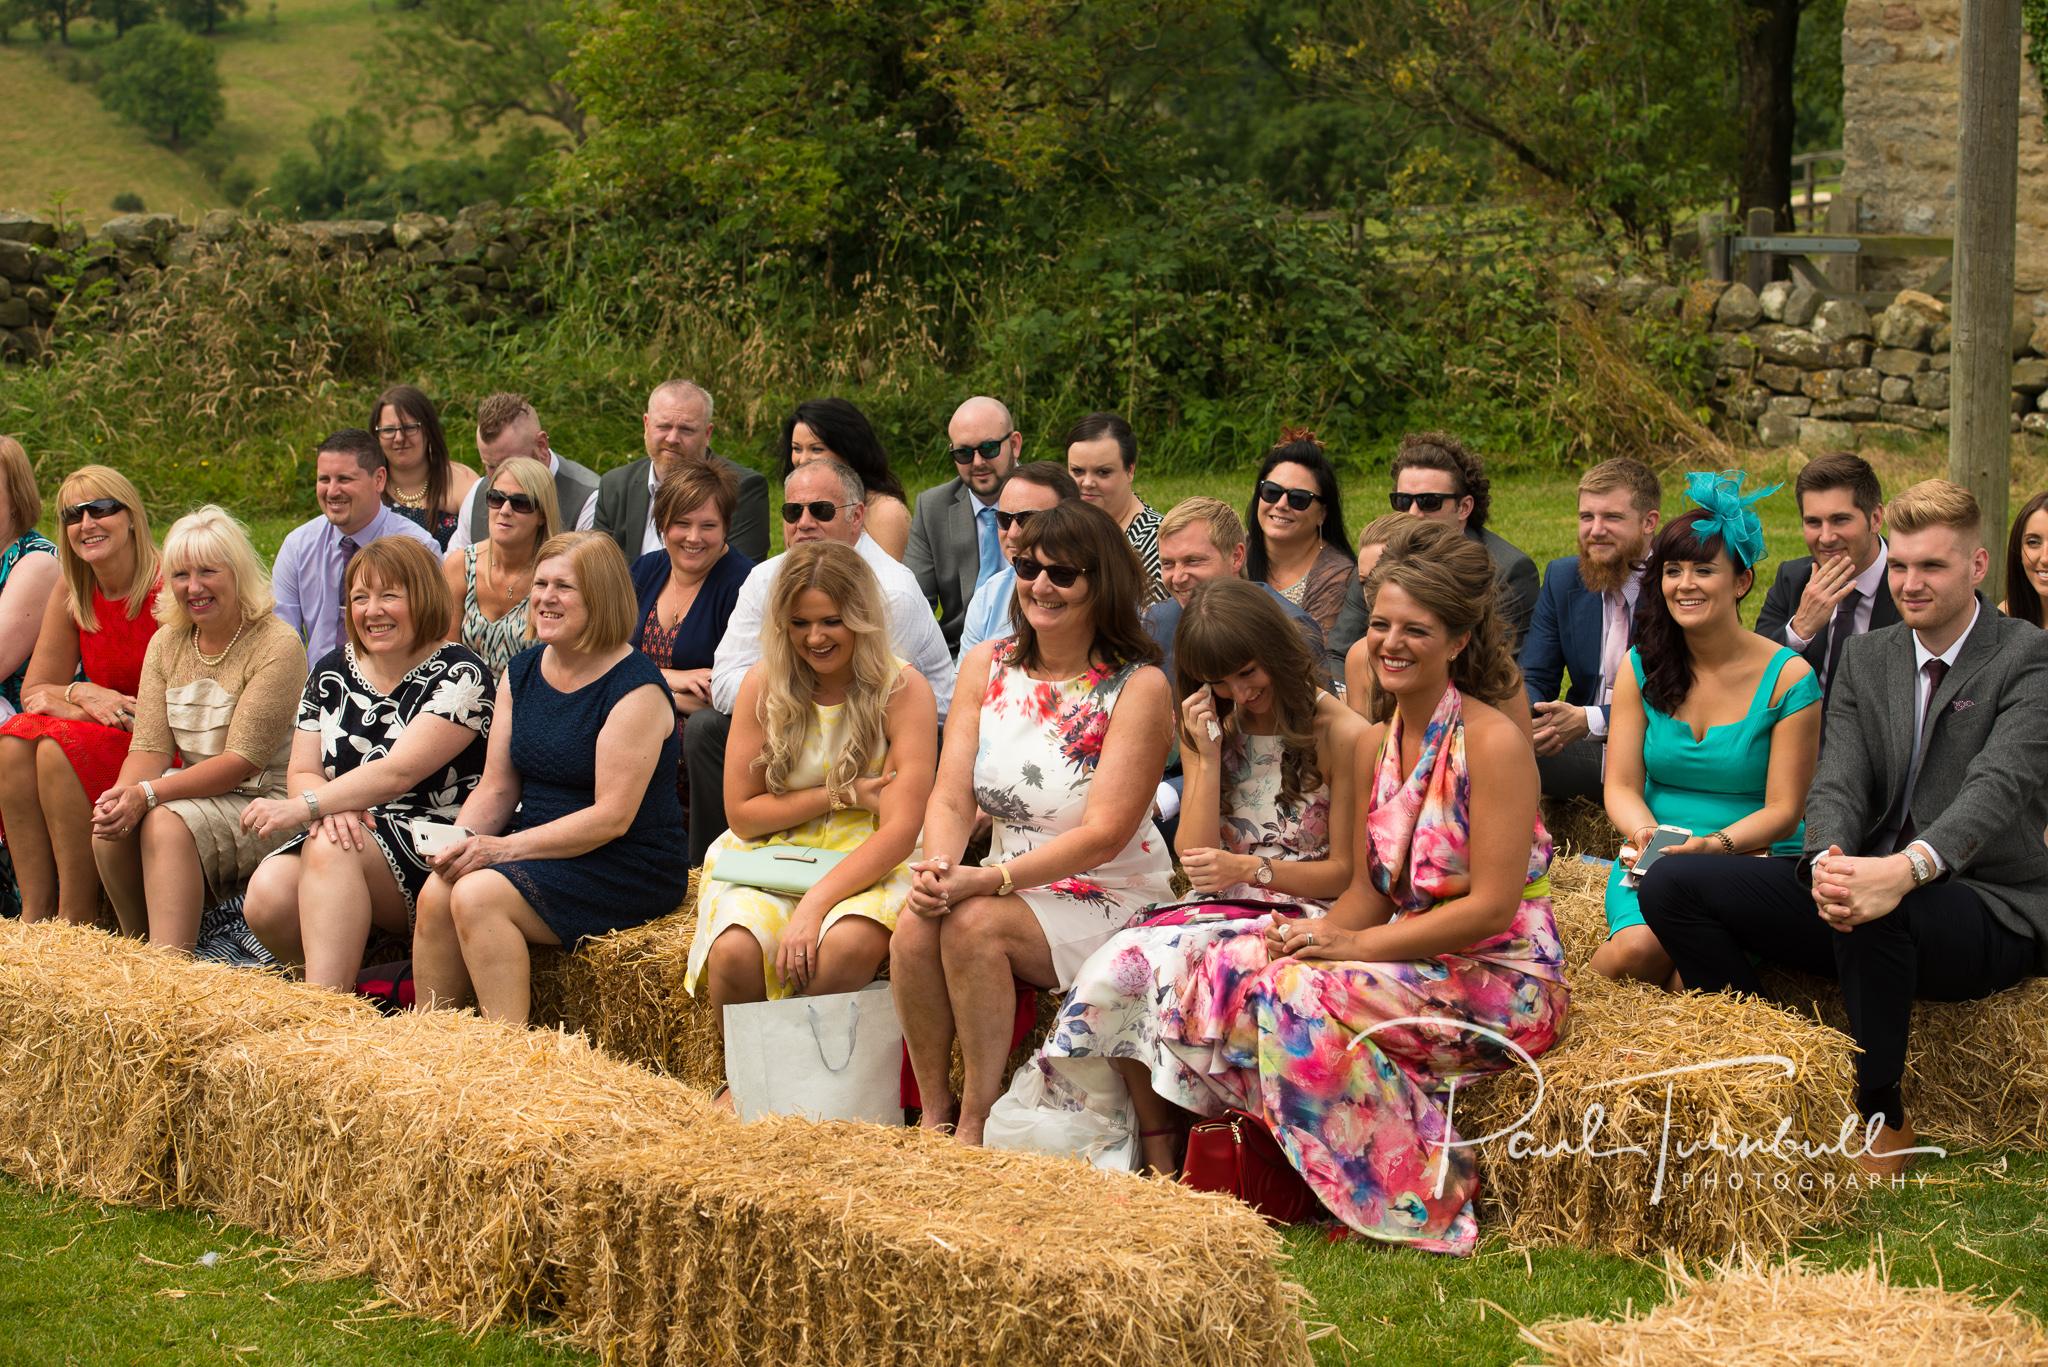 wedding-photographer-hilltop-farm-ilton-yorkshire-019.jpg